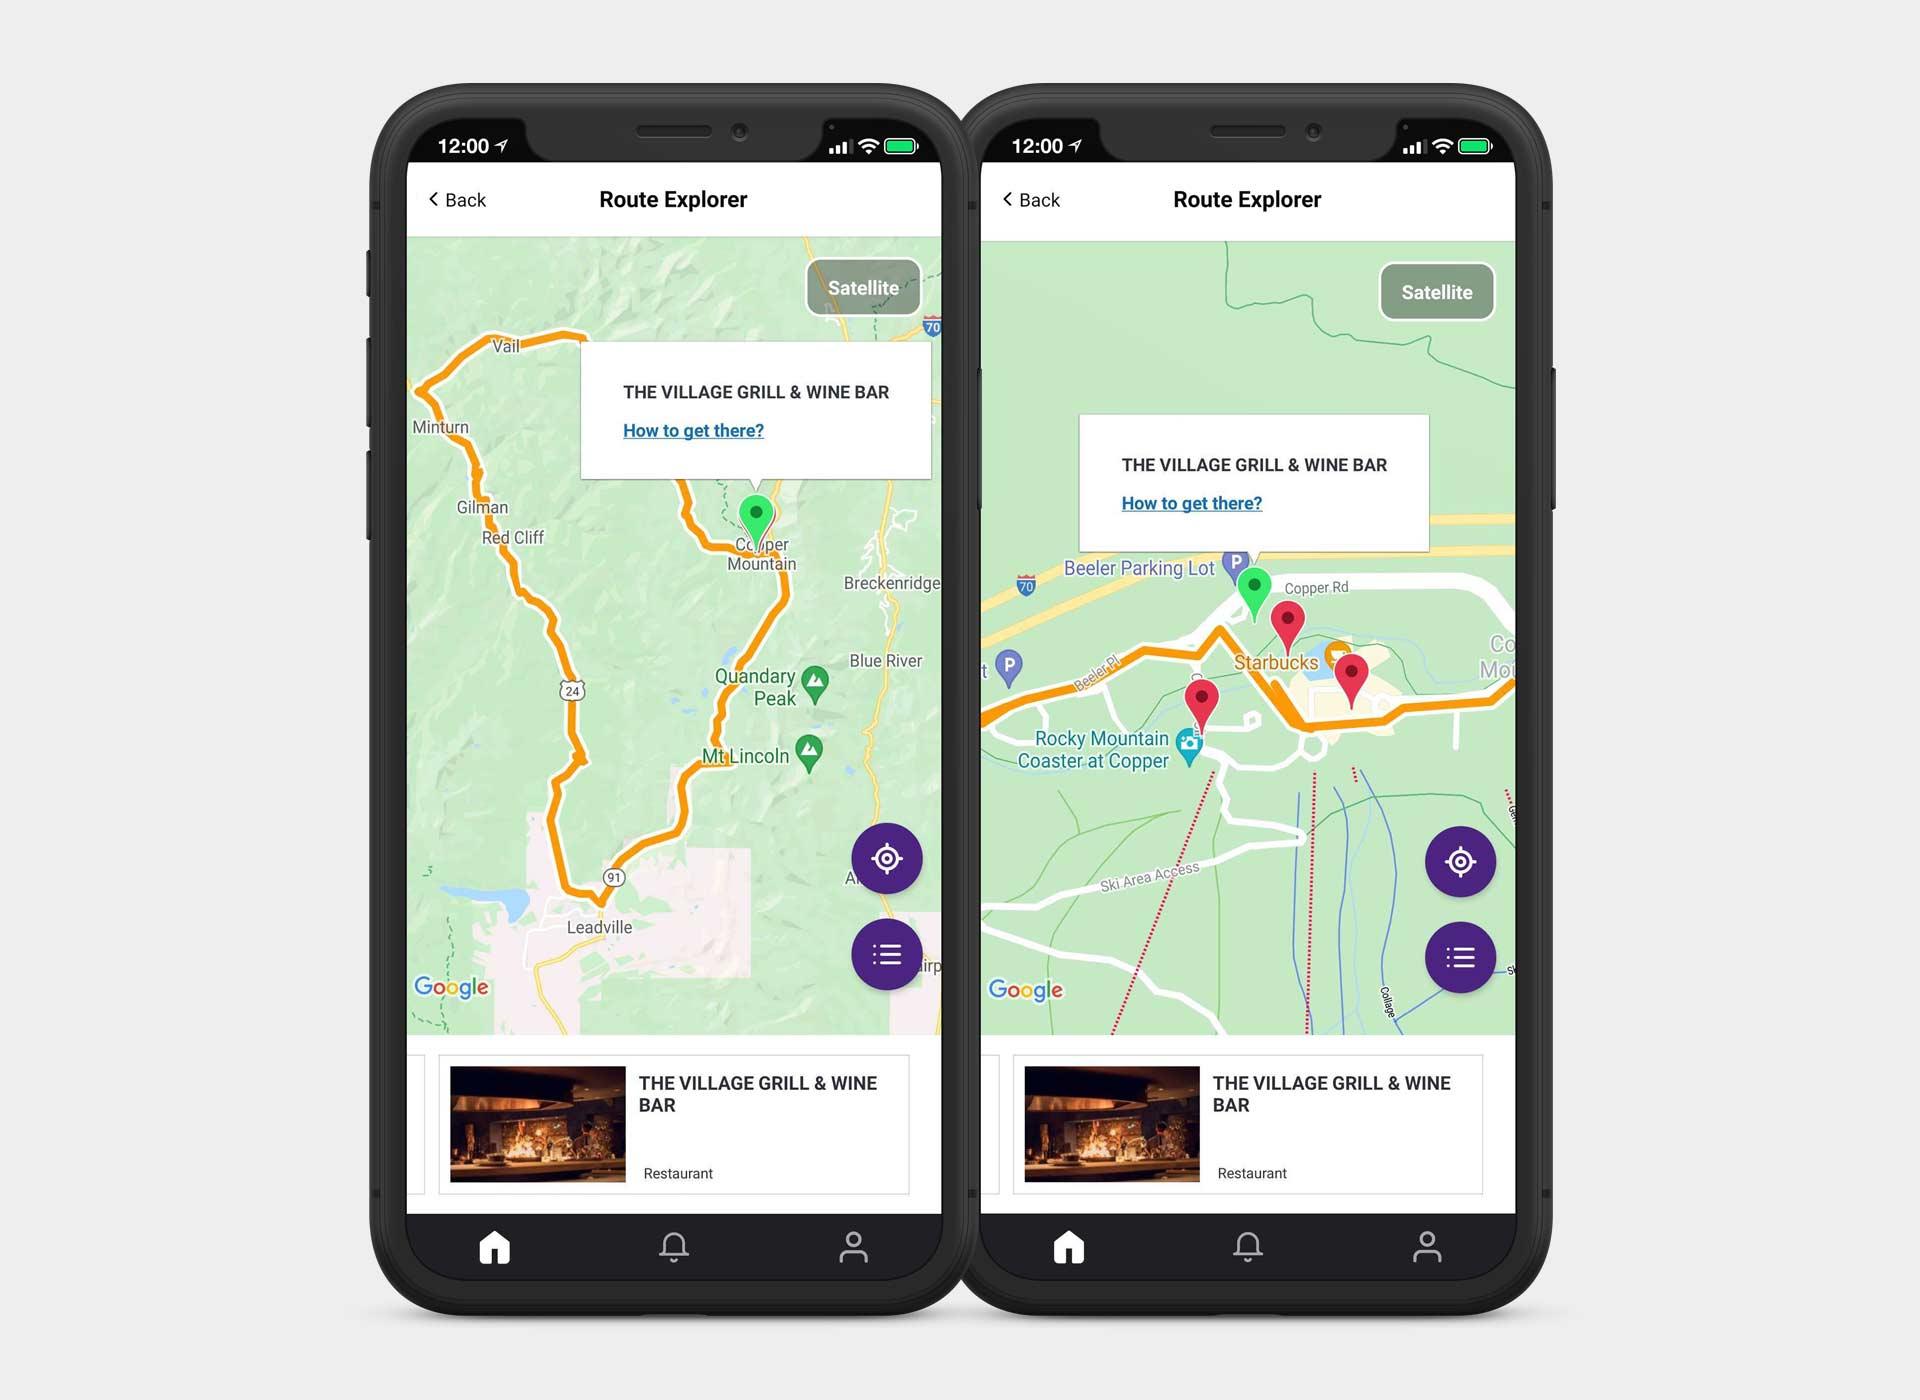 route-explorer-mobile-apps-development-company-builder-tracking-design-creator-application